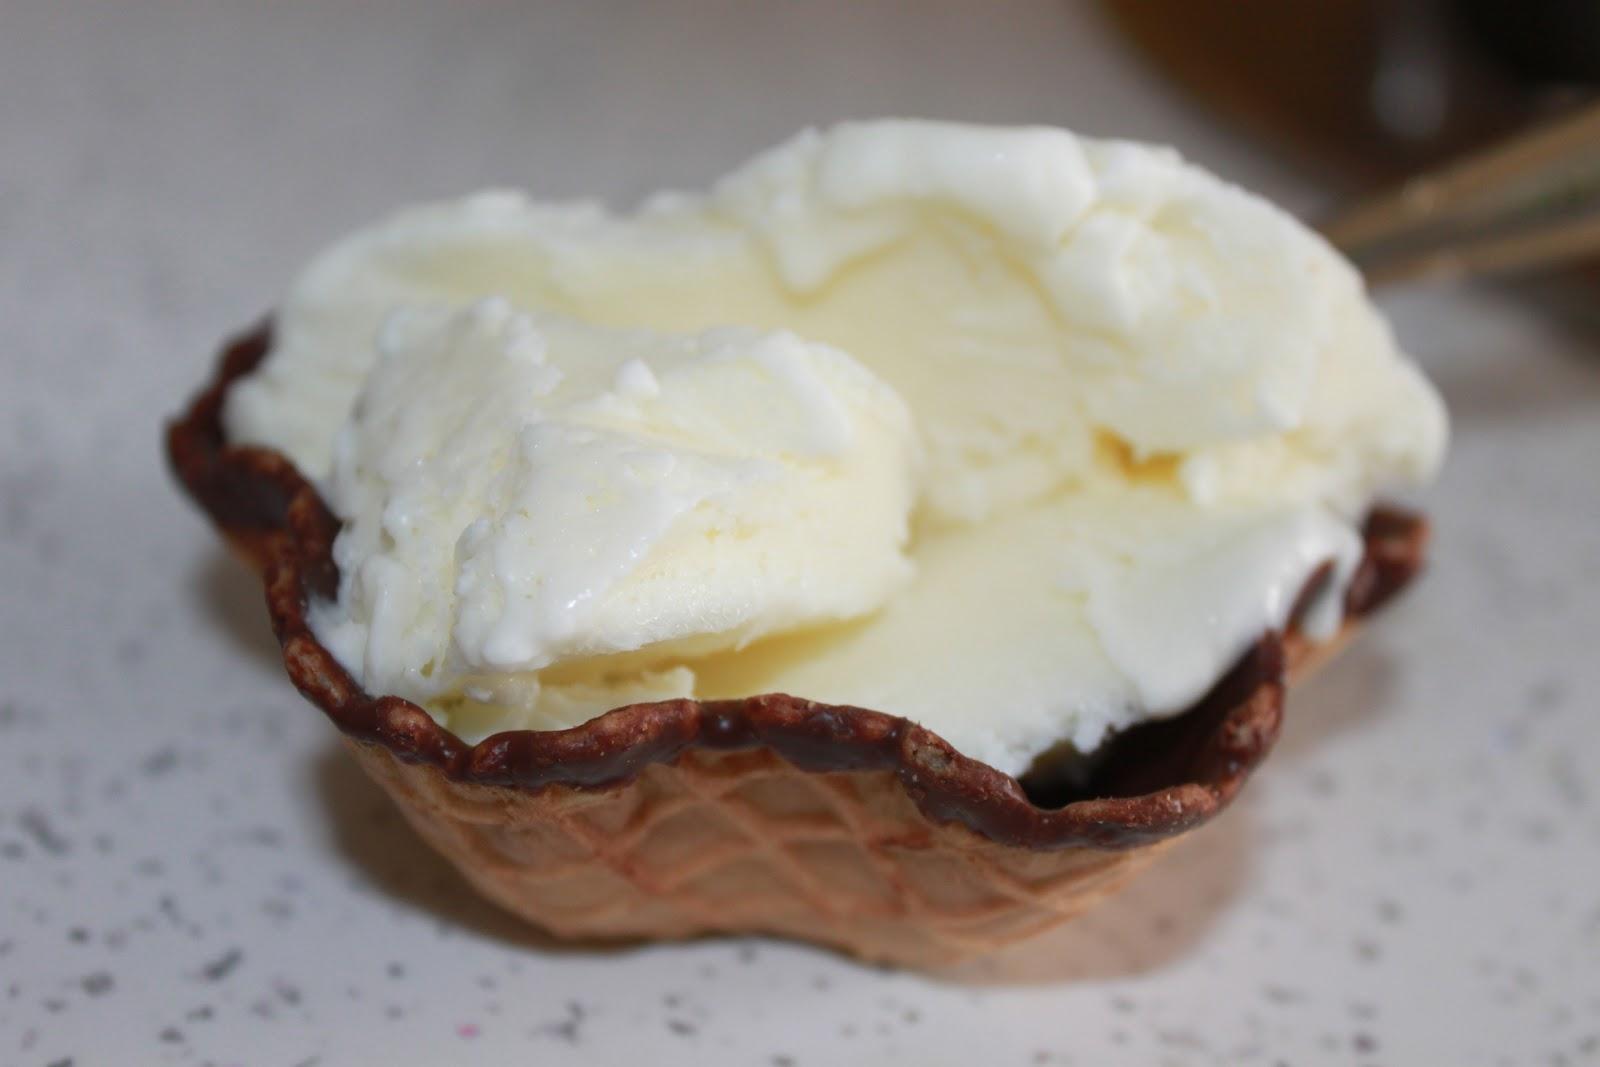 yogur gloria: